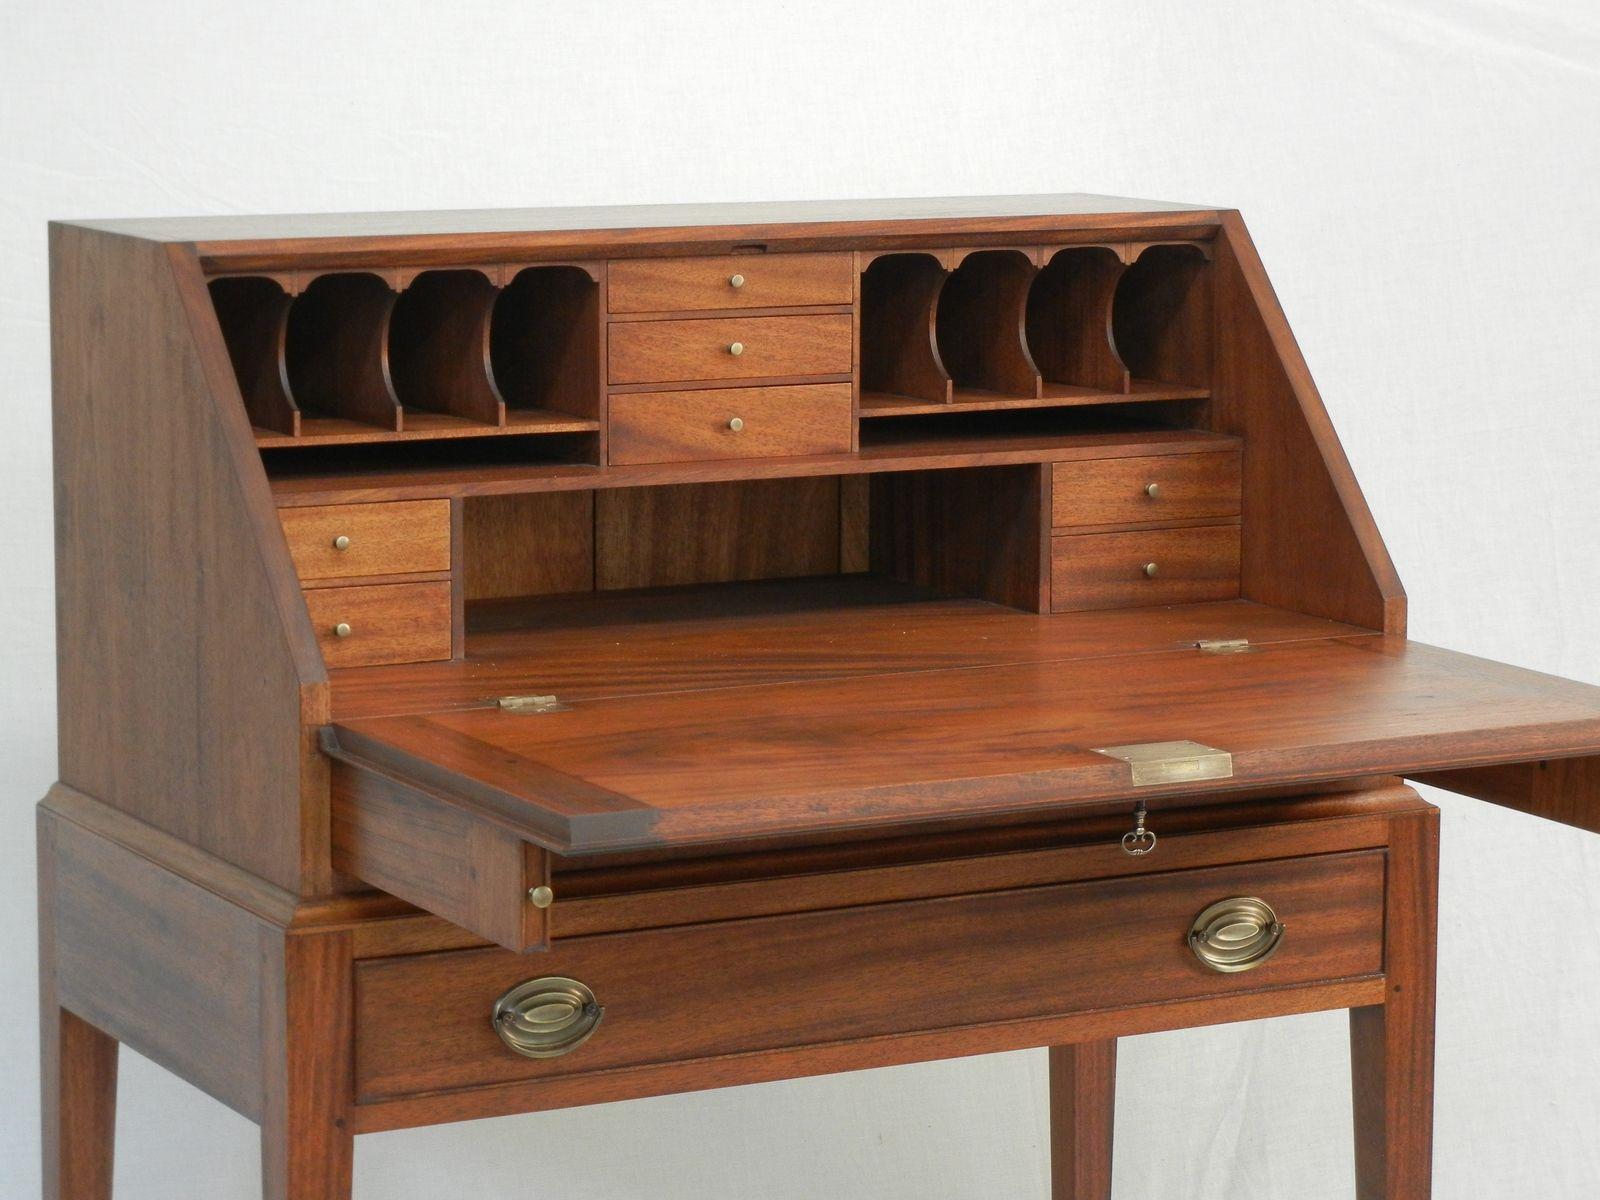 Mahogany Desk Slant Top Desk Nice Place To Write An Autobiography Mahogany Desk Woodworking Desk Plans Cabinet Woodworking Plans